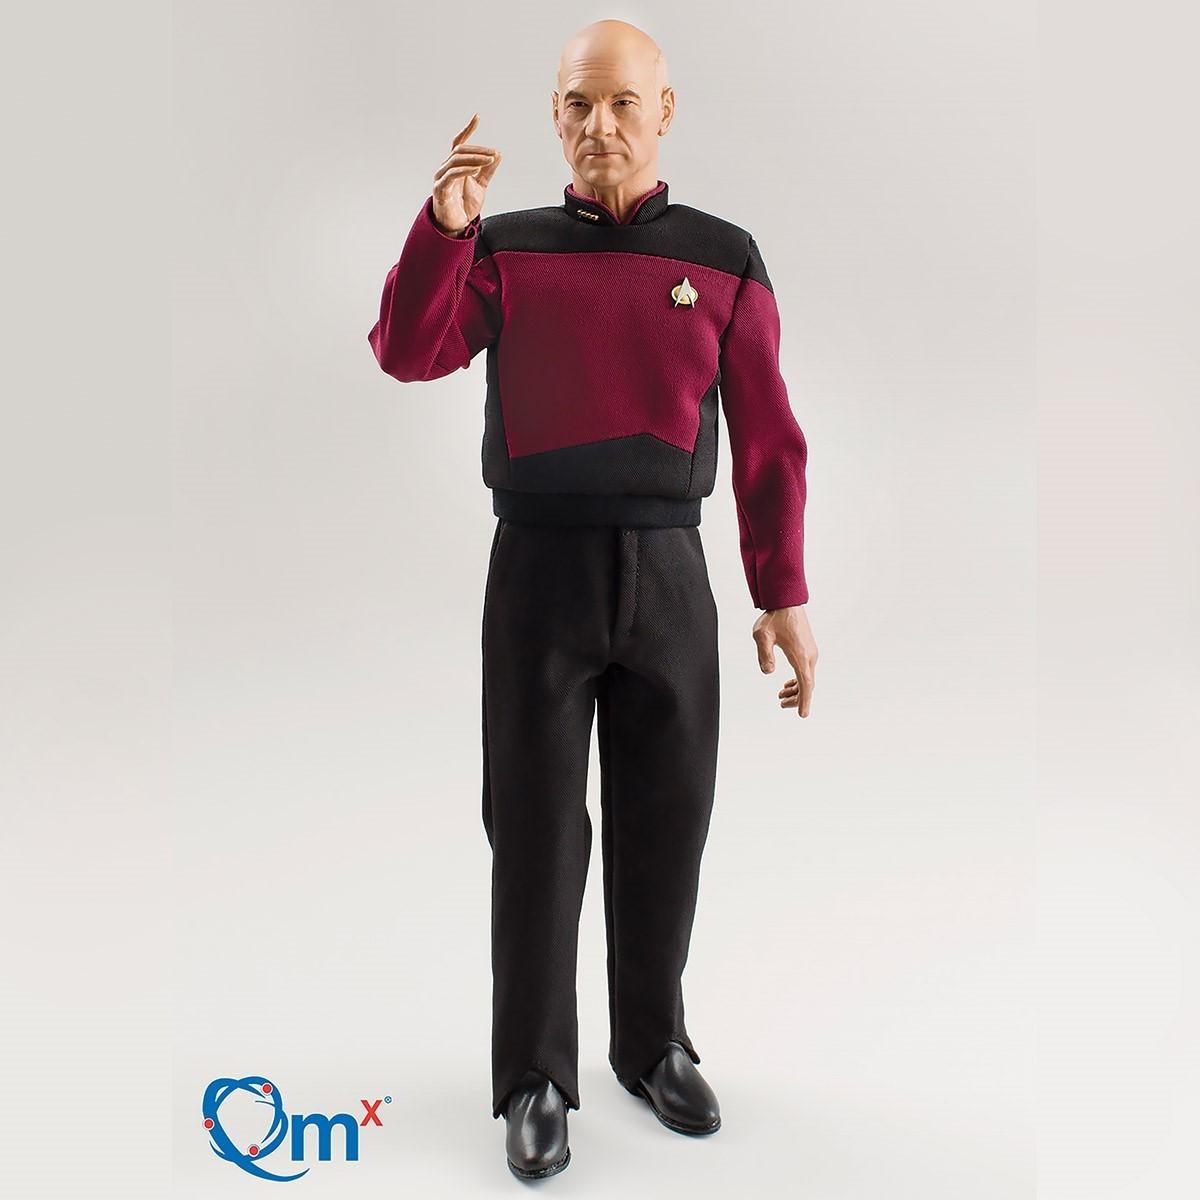 Picture of Captain Jean-Luc Picard Star Trek Figure